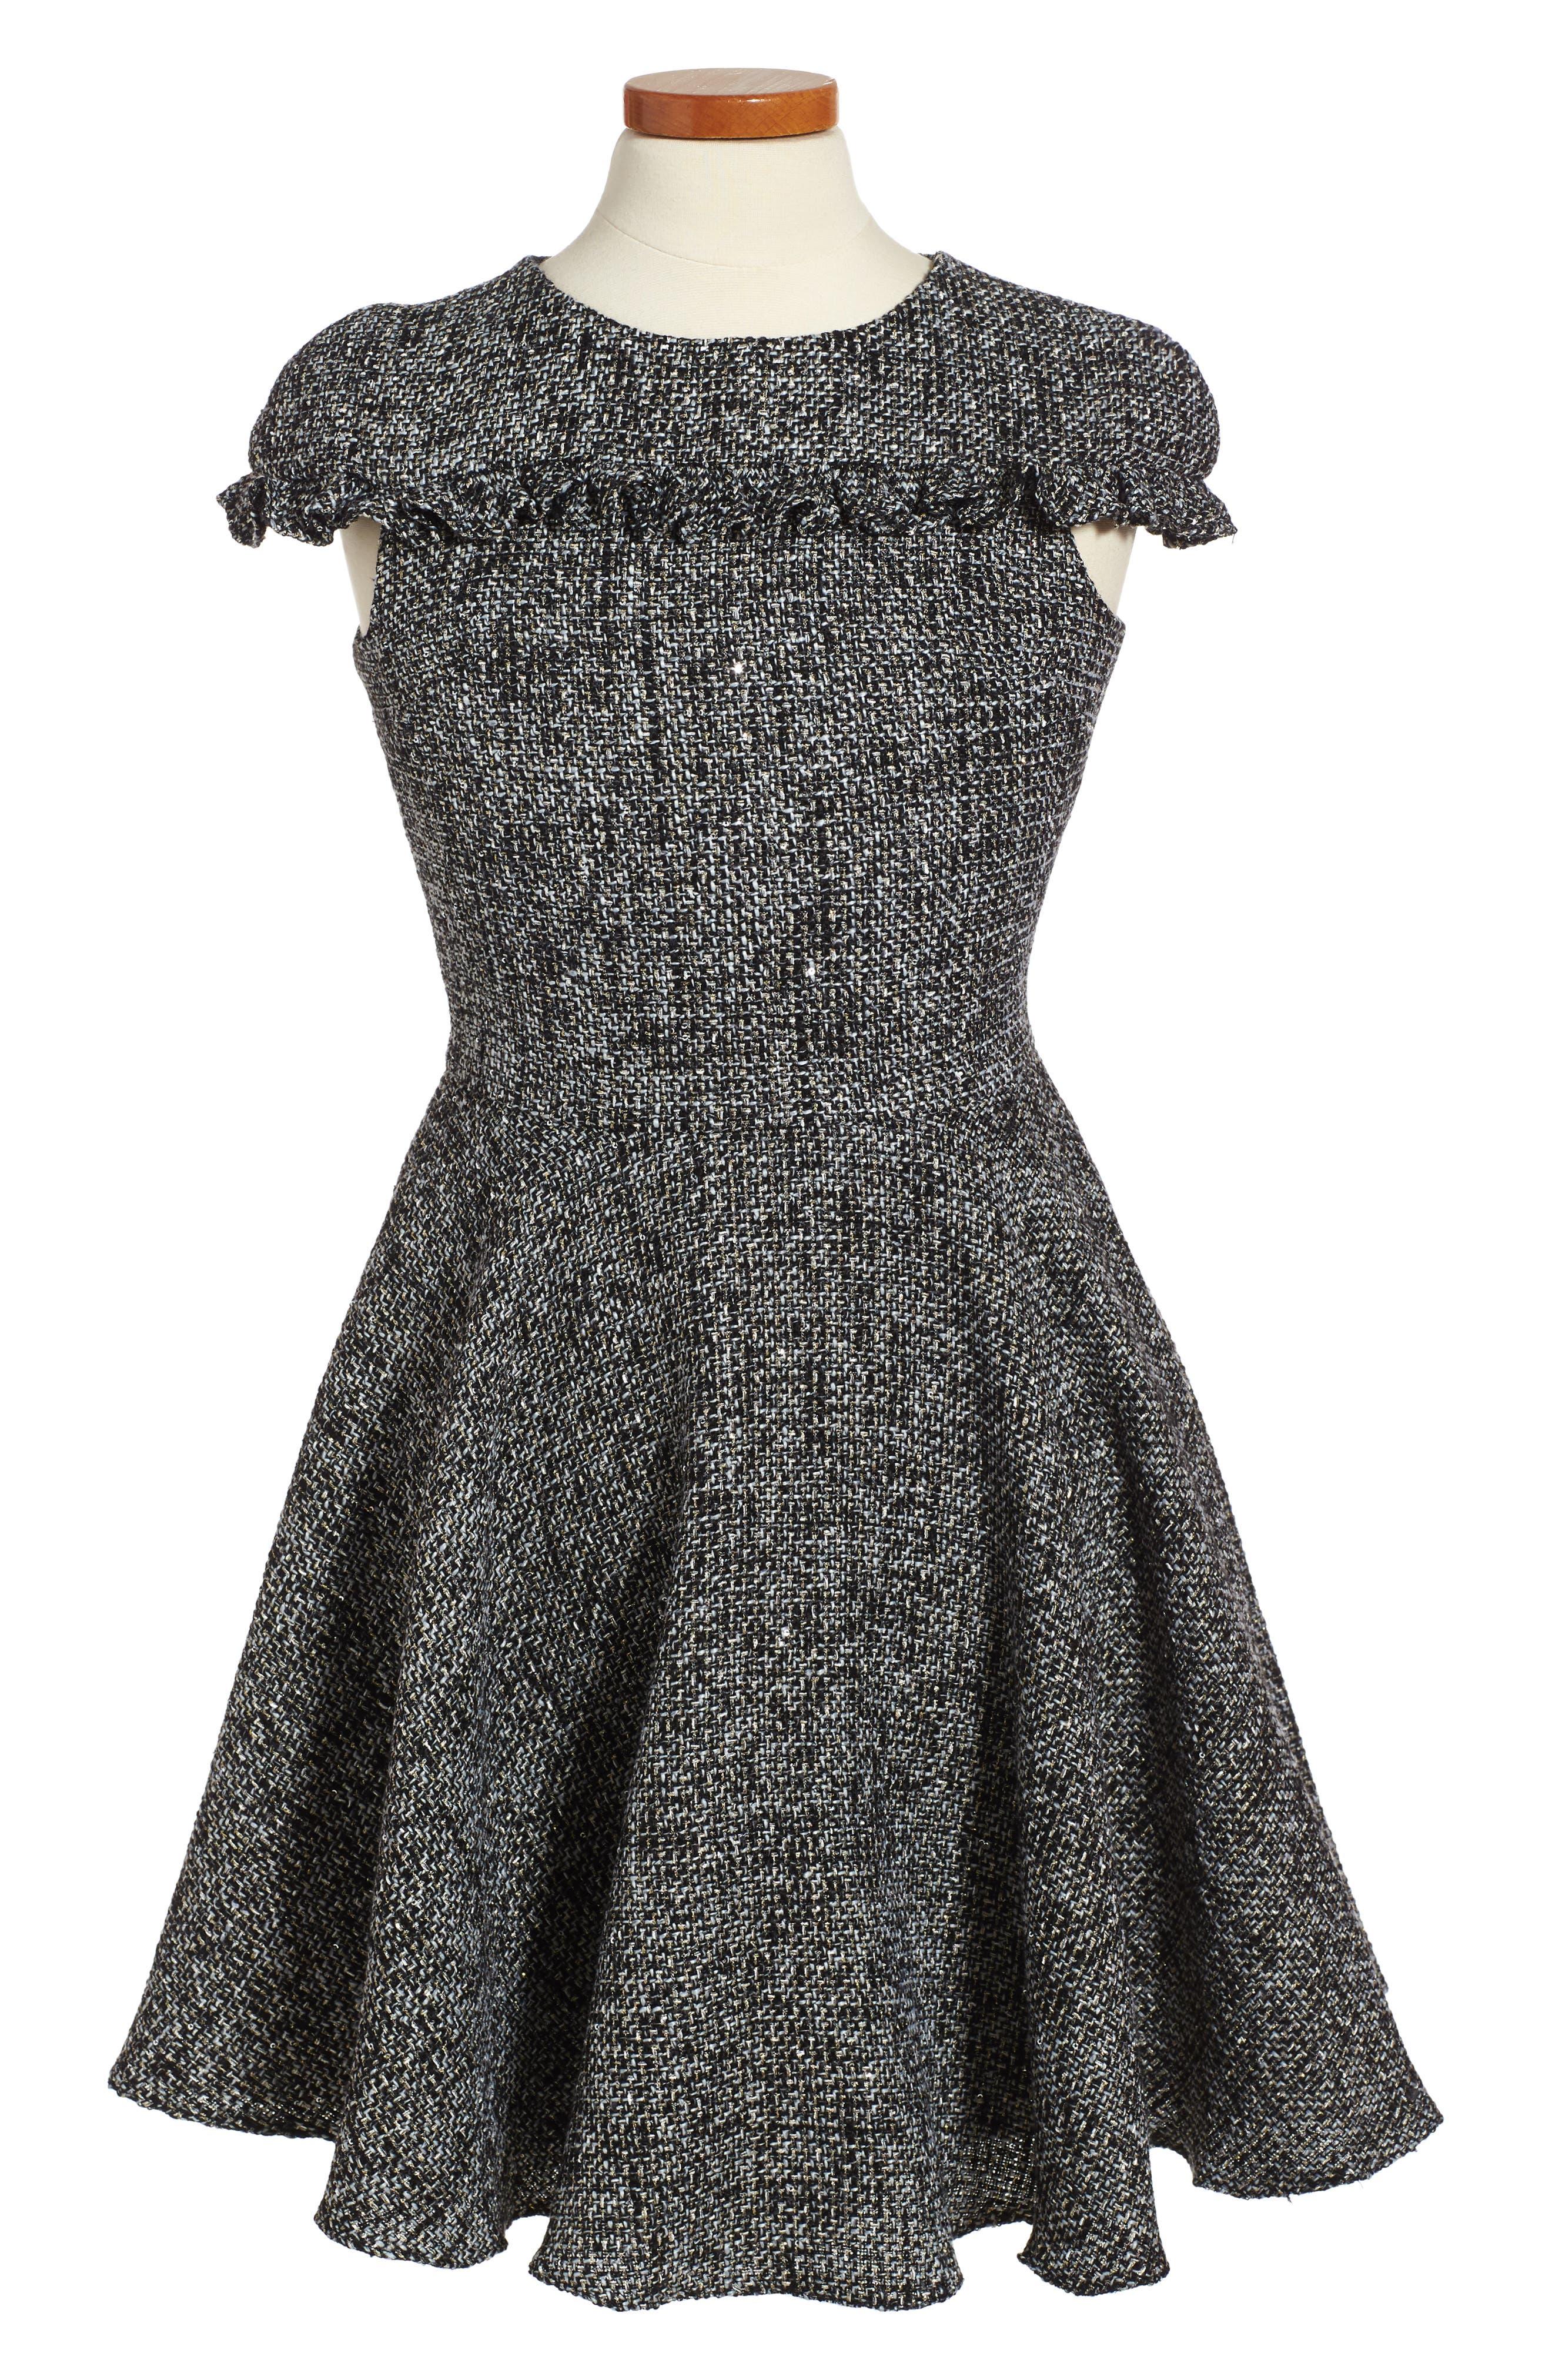 Alternate Image 1 Selected - David Charles Sequin Tweed Dress (Big Girls)